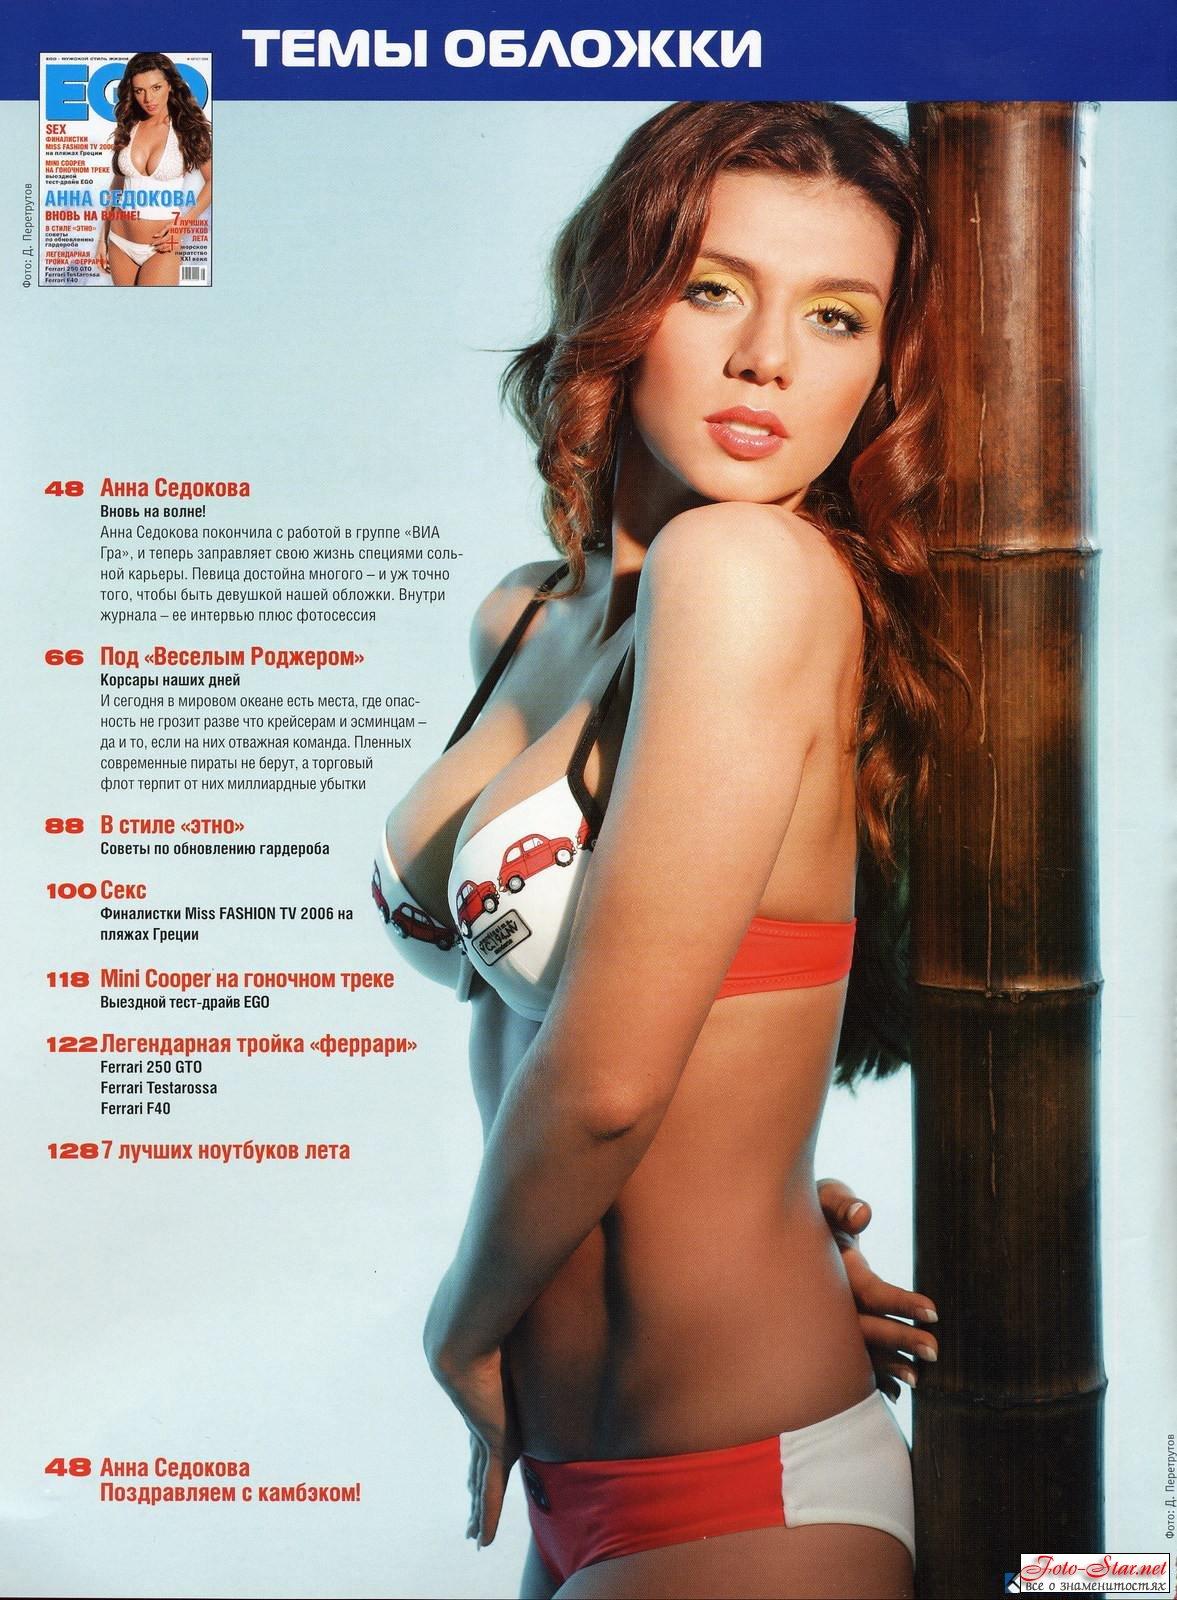 79273_Anna_Sedokova_6Ego_Russia6_-2_123_1lo.jpg